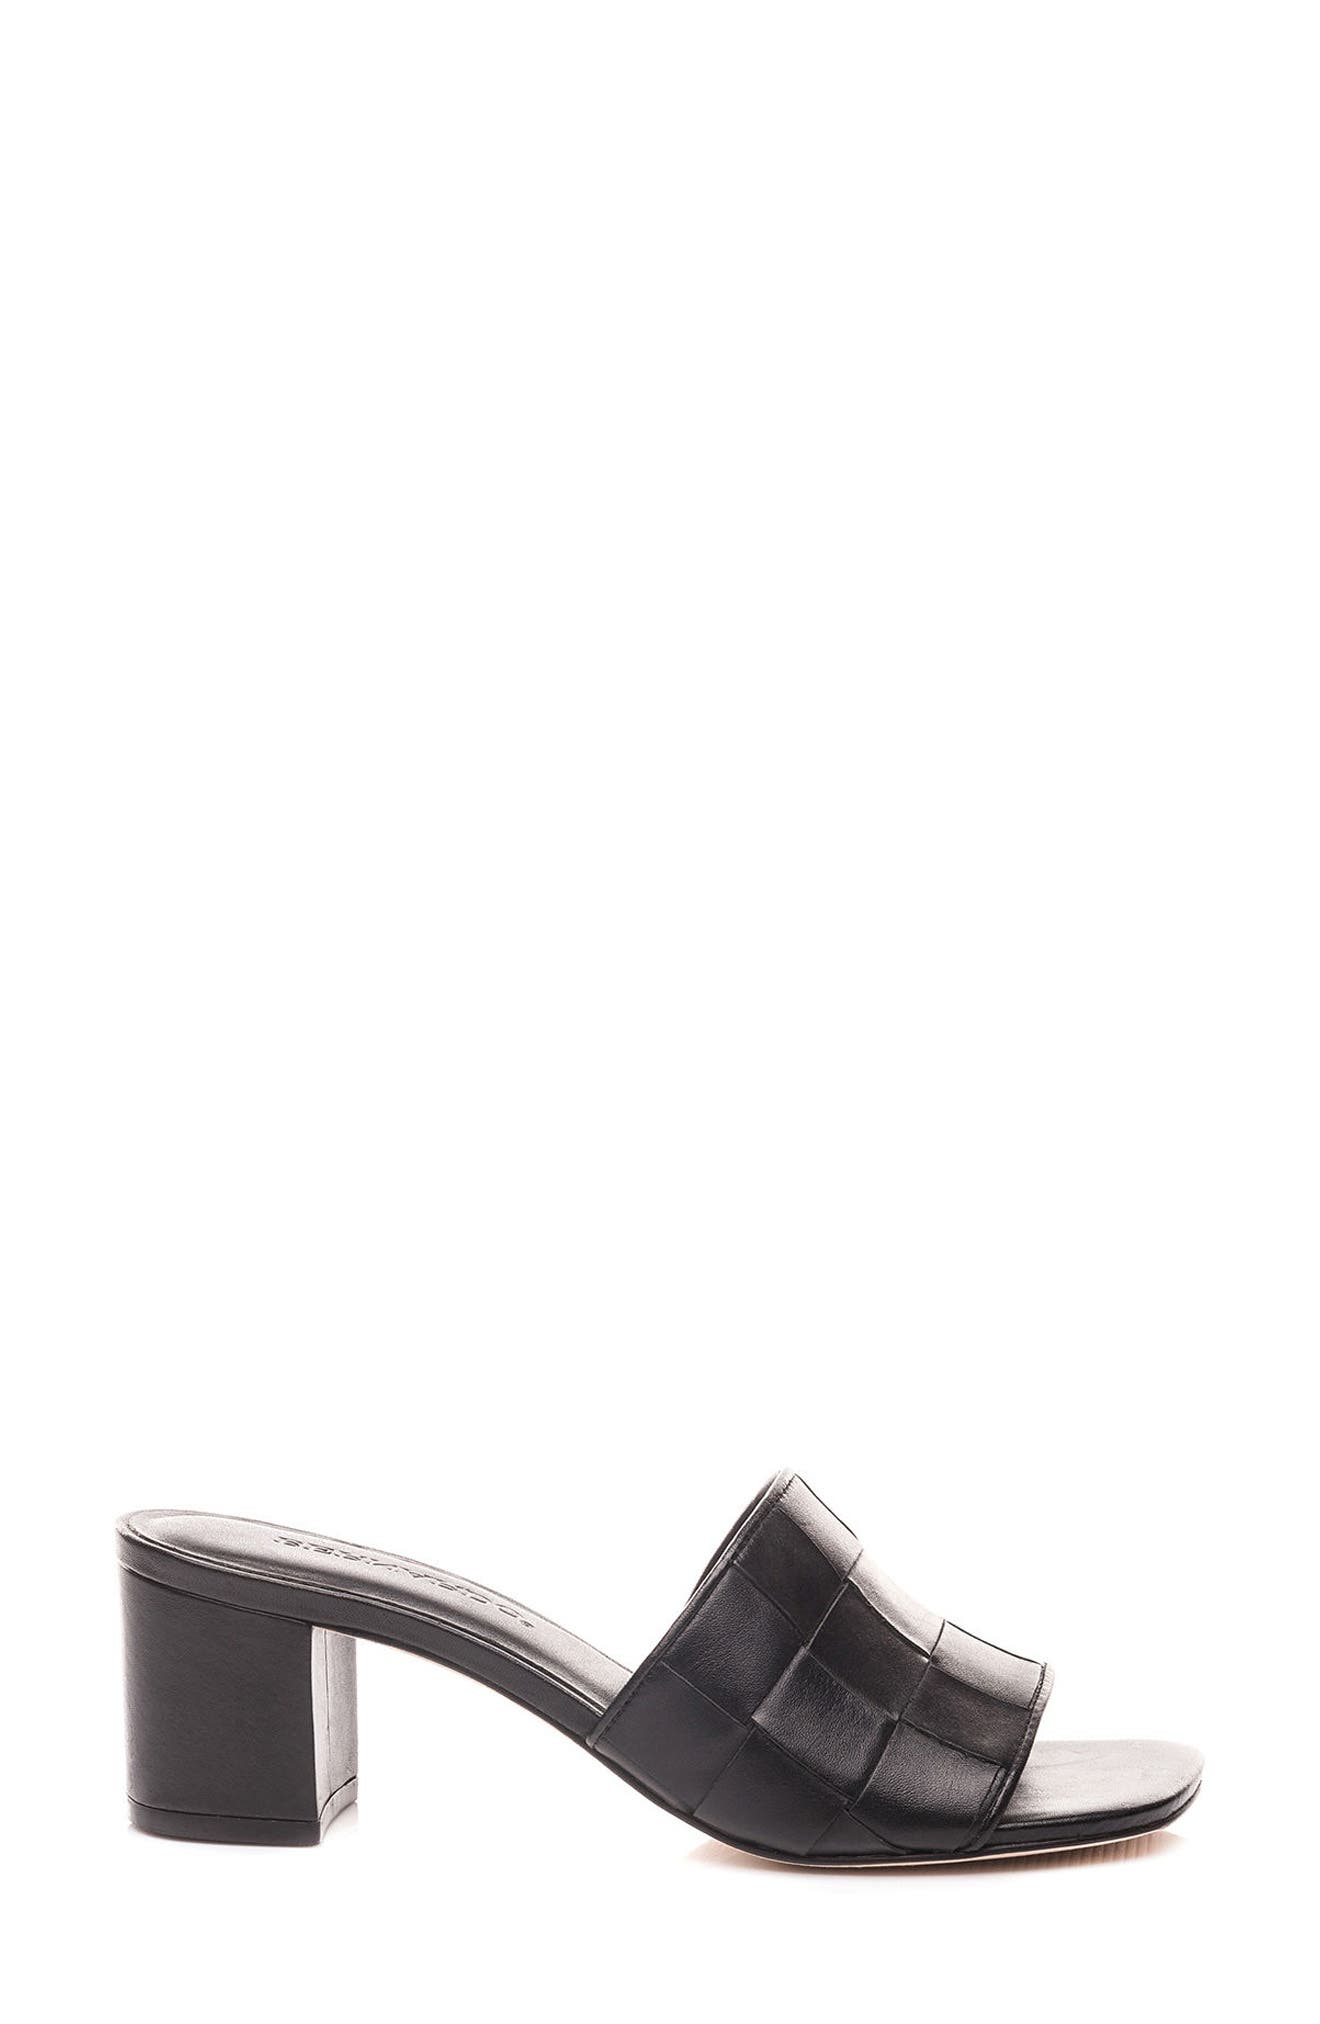 Bernardo Bridget Block Heel Sandal,                             Alternate thumbnail 9, color,